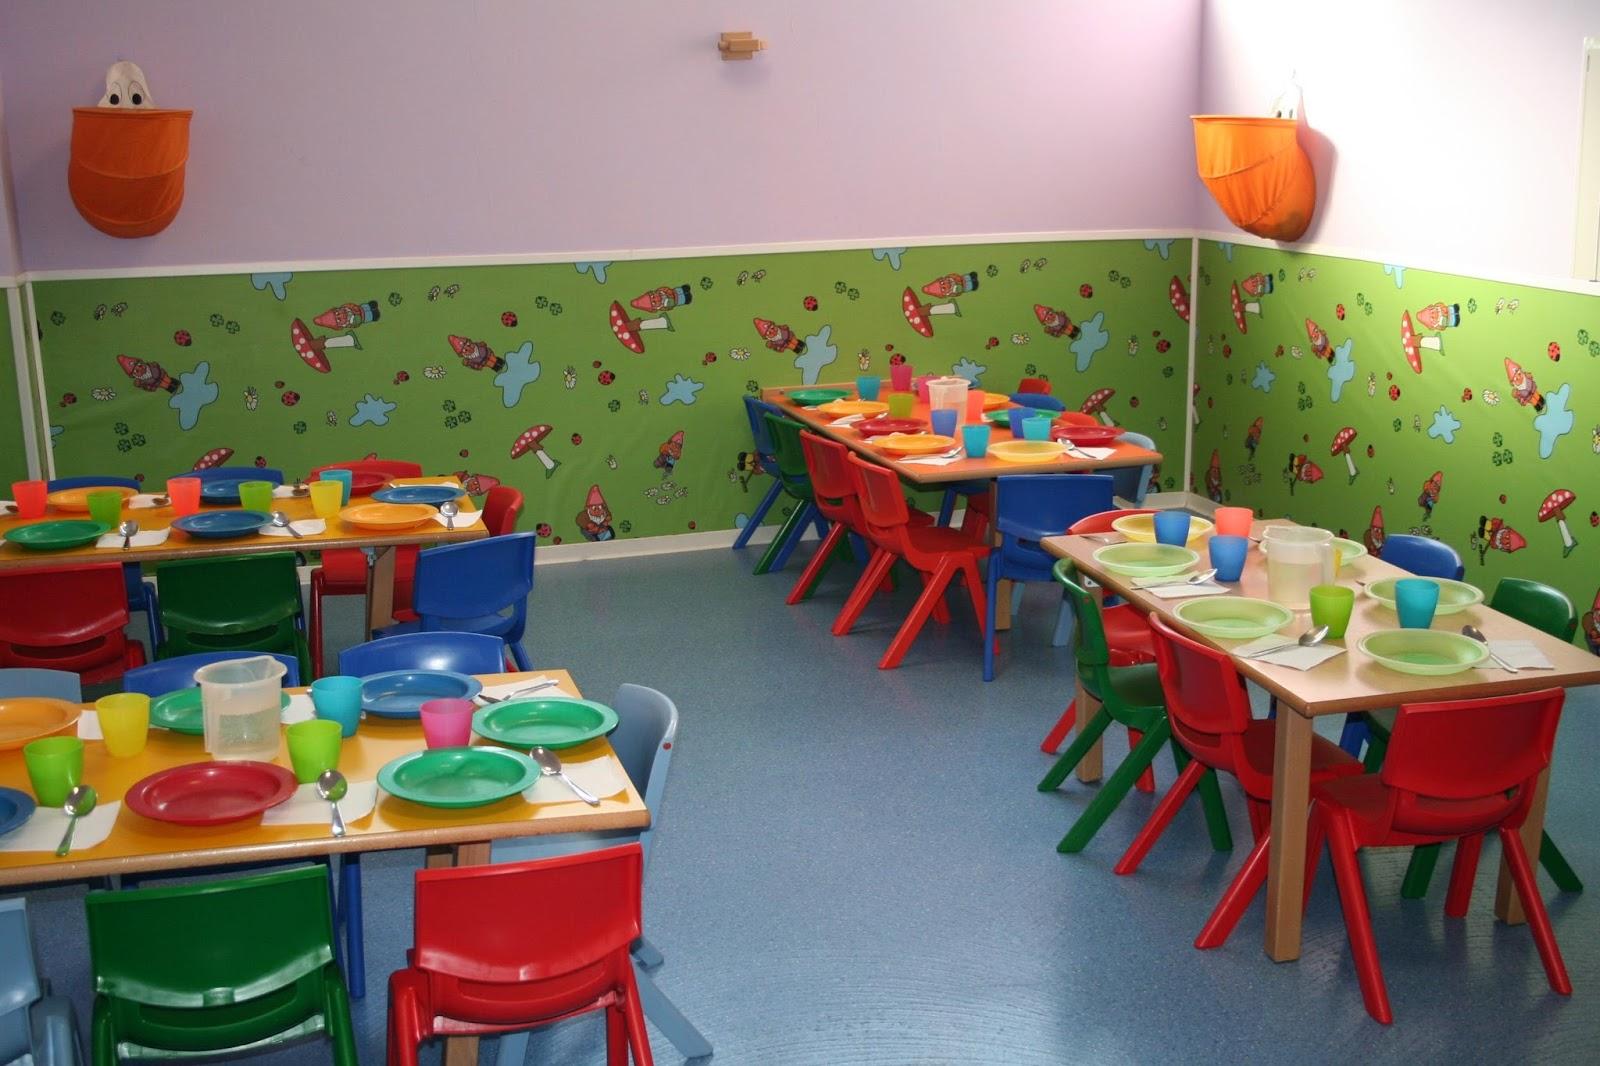 escuela infantil la lunita On comedor escuela infantil